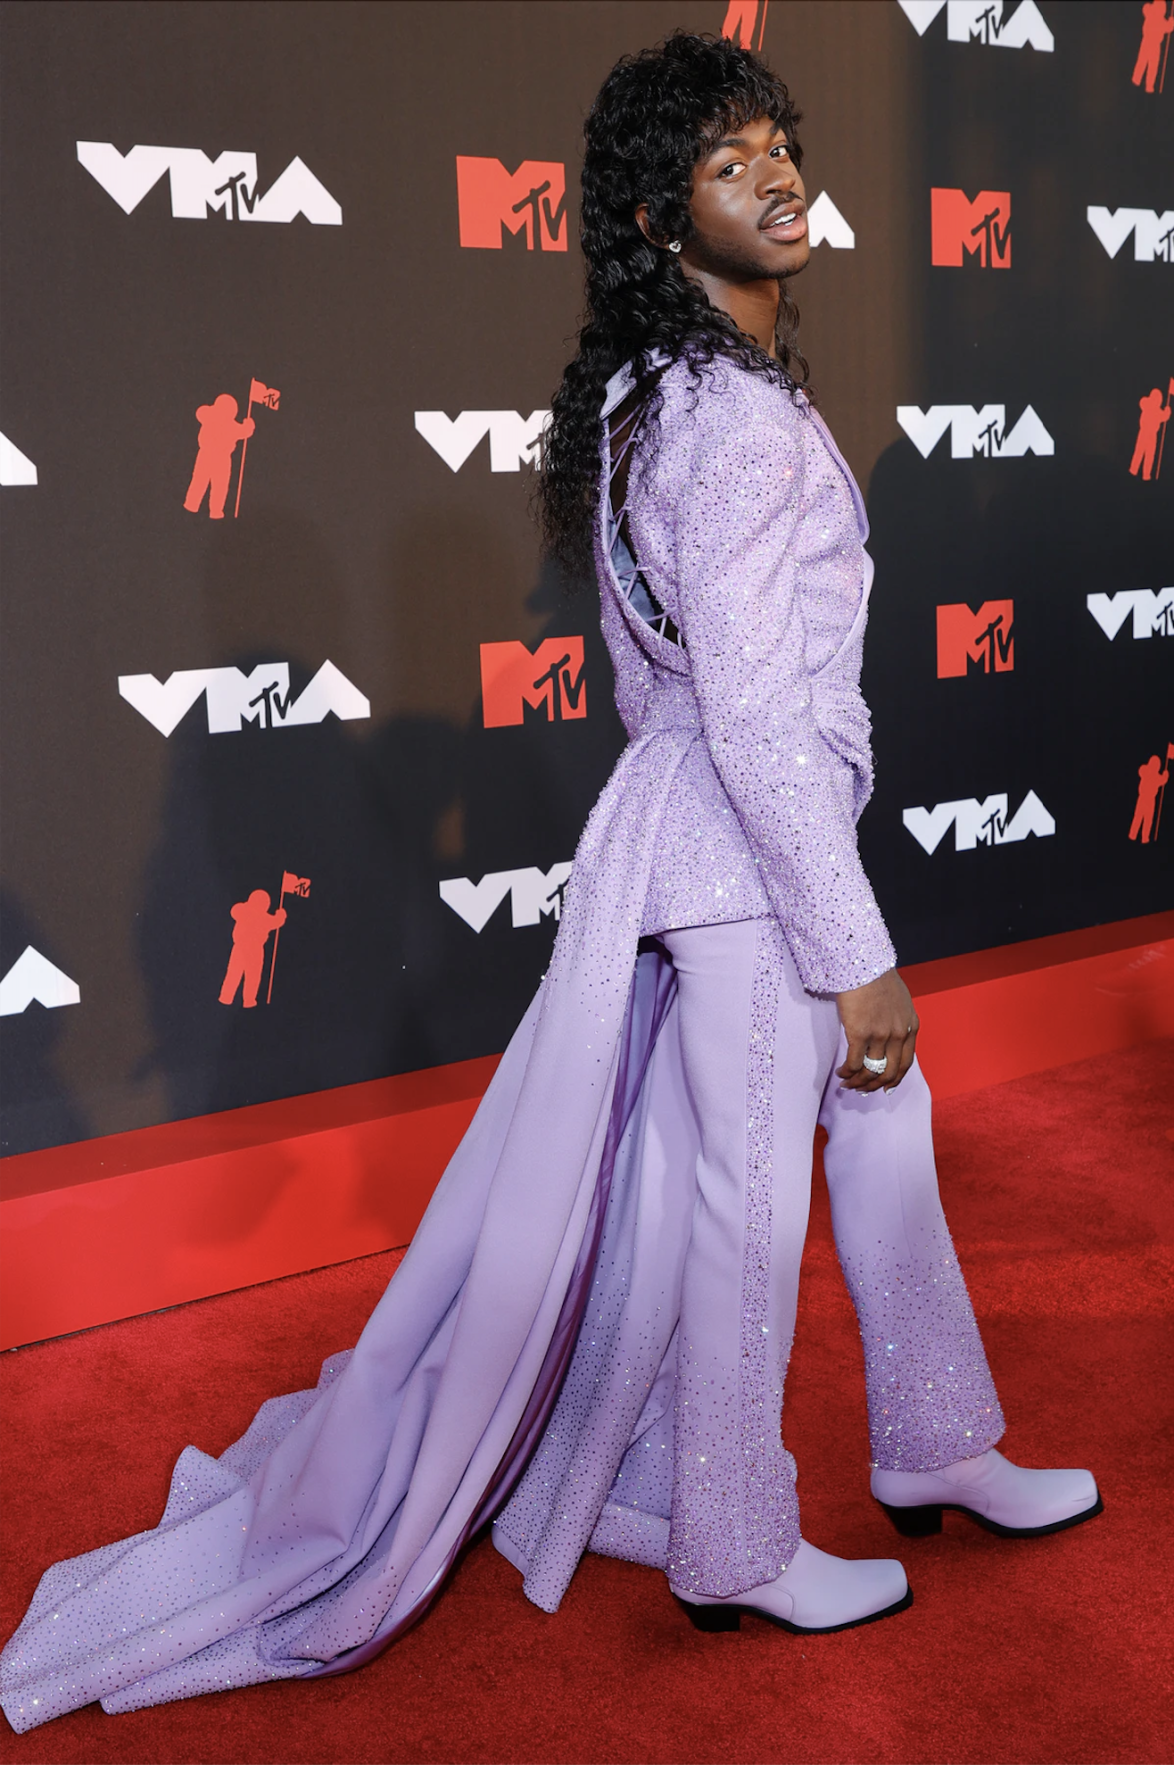 Lil Nas X VMA red carpet